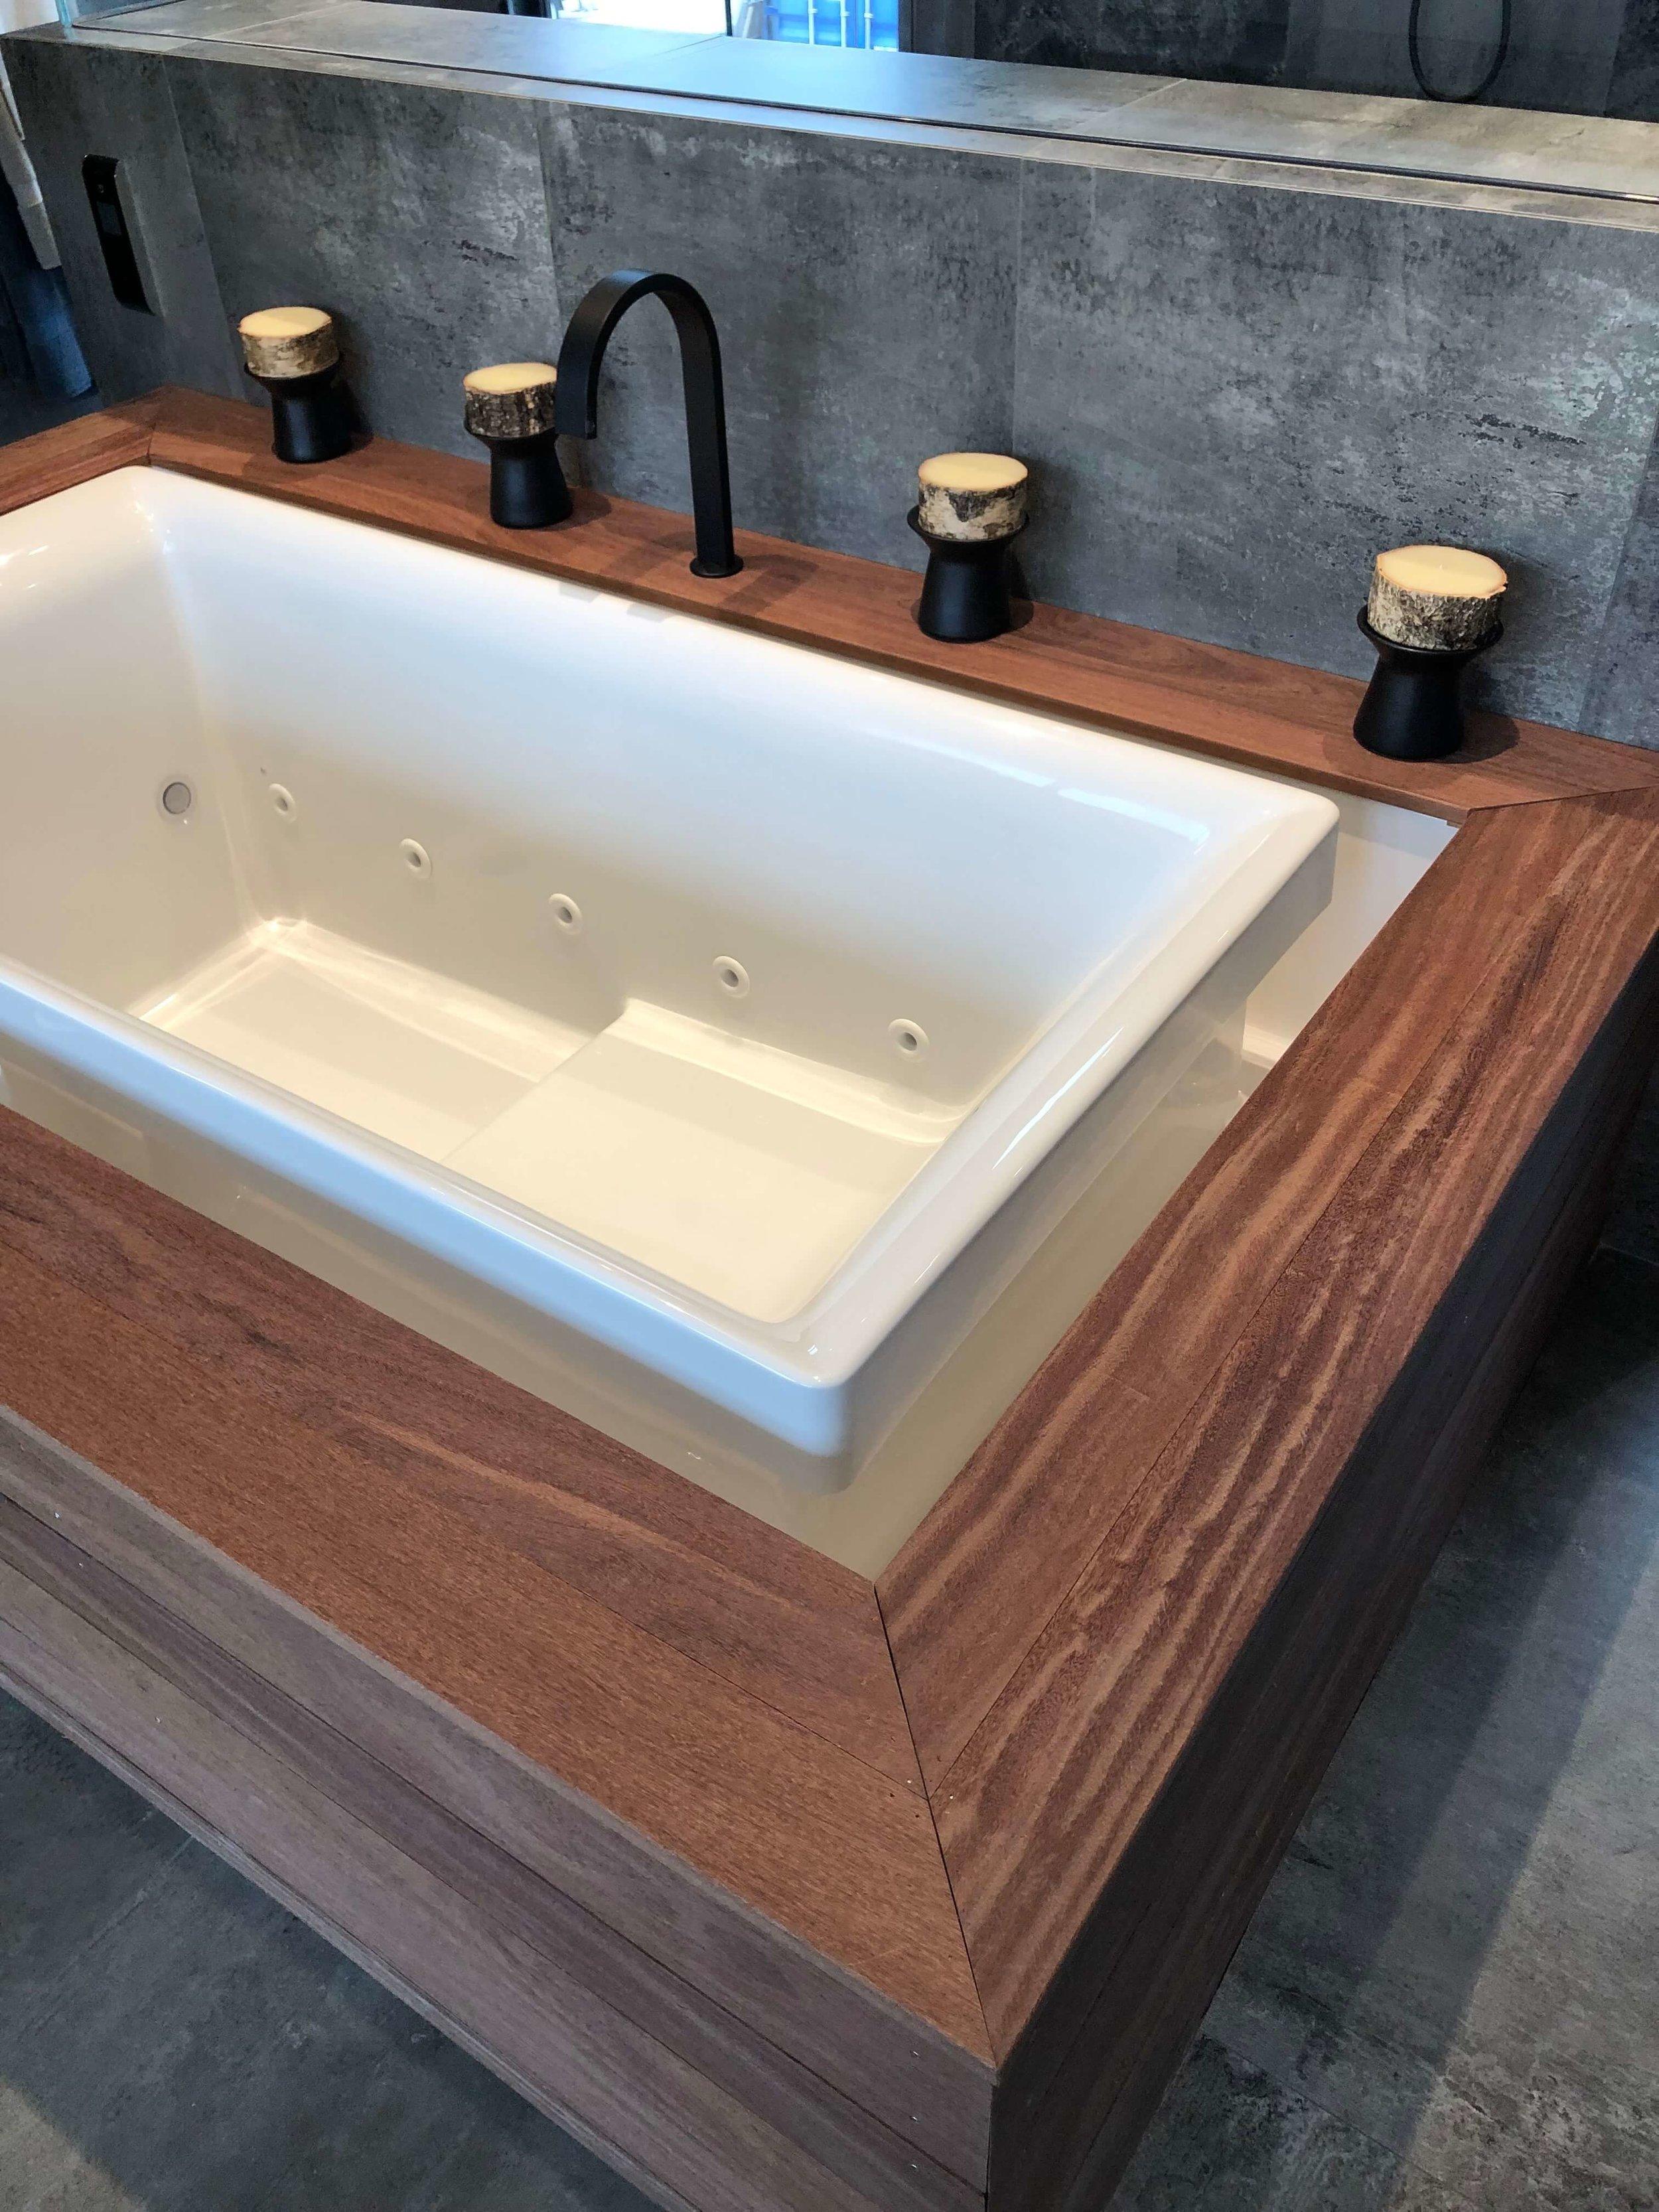 Master bath infinity tub in The New American Remodel 2019. #masterbathroom #hometour #contemporaryhome